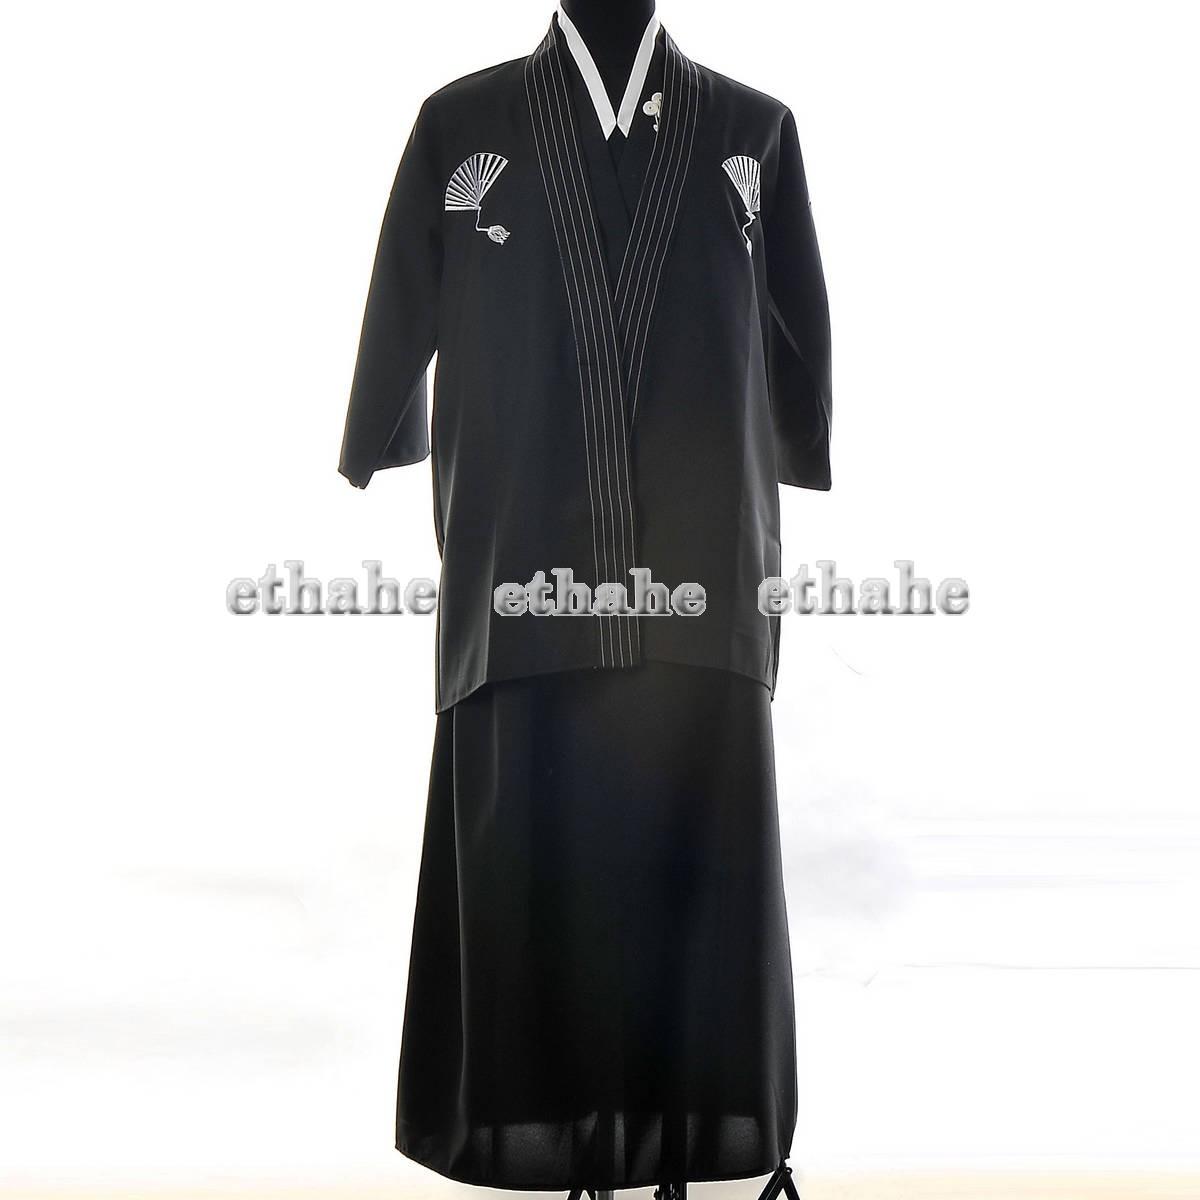 Japan-Kimono-Mens-Haori-Hakama-Samura-Robe-Black-G46Q